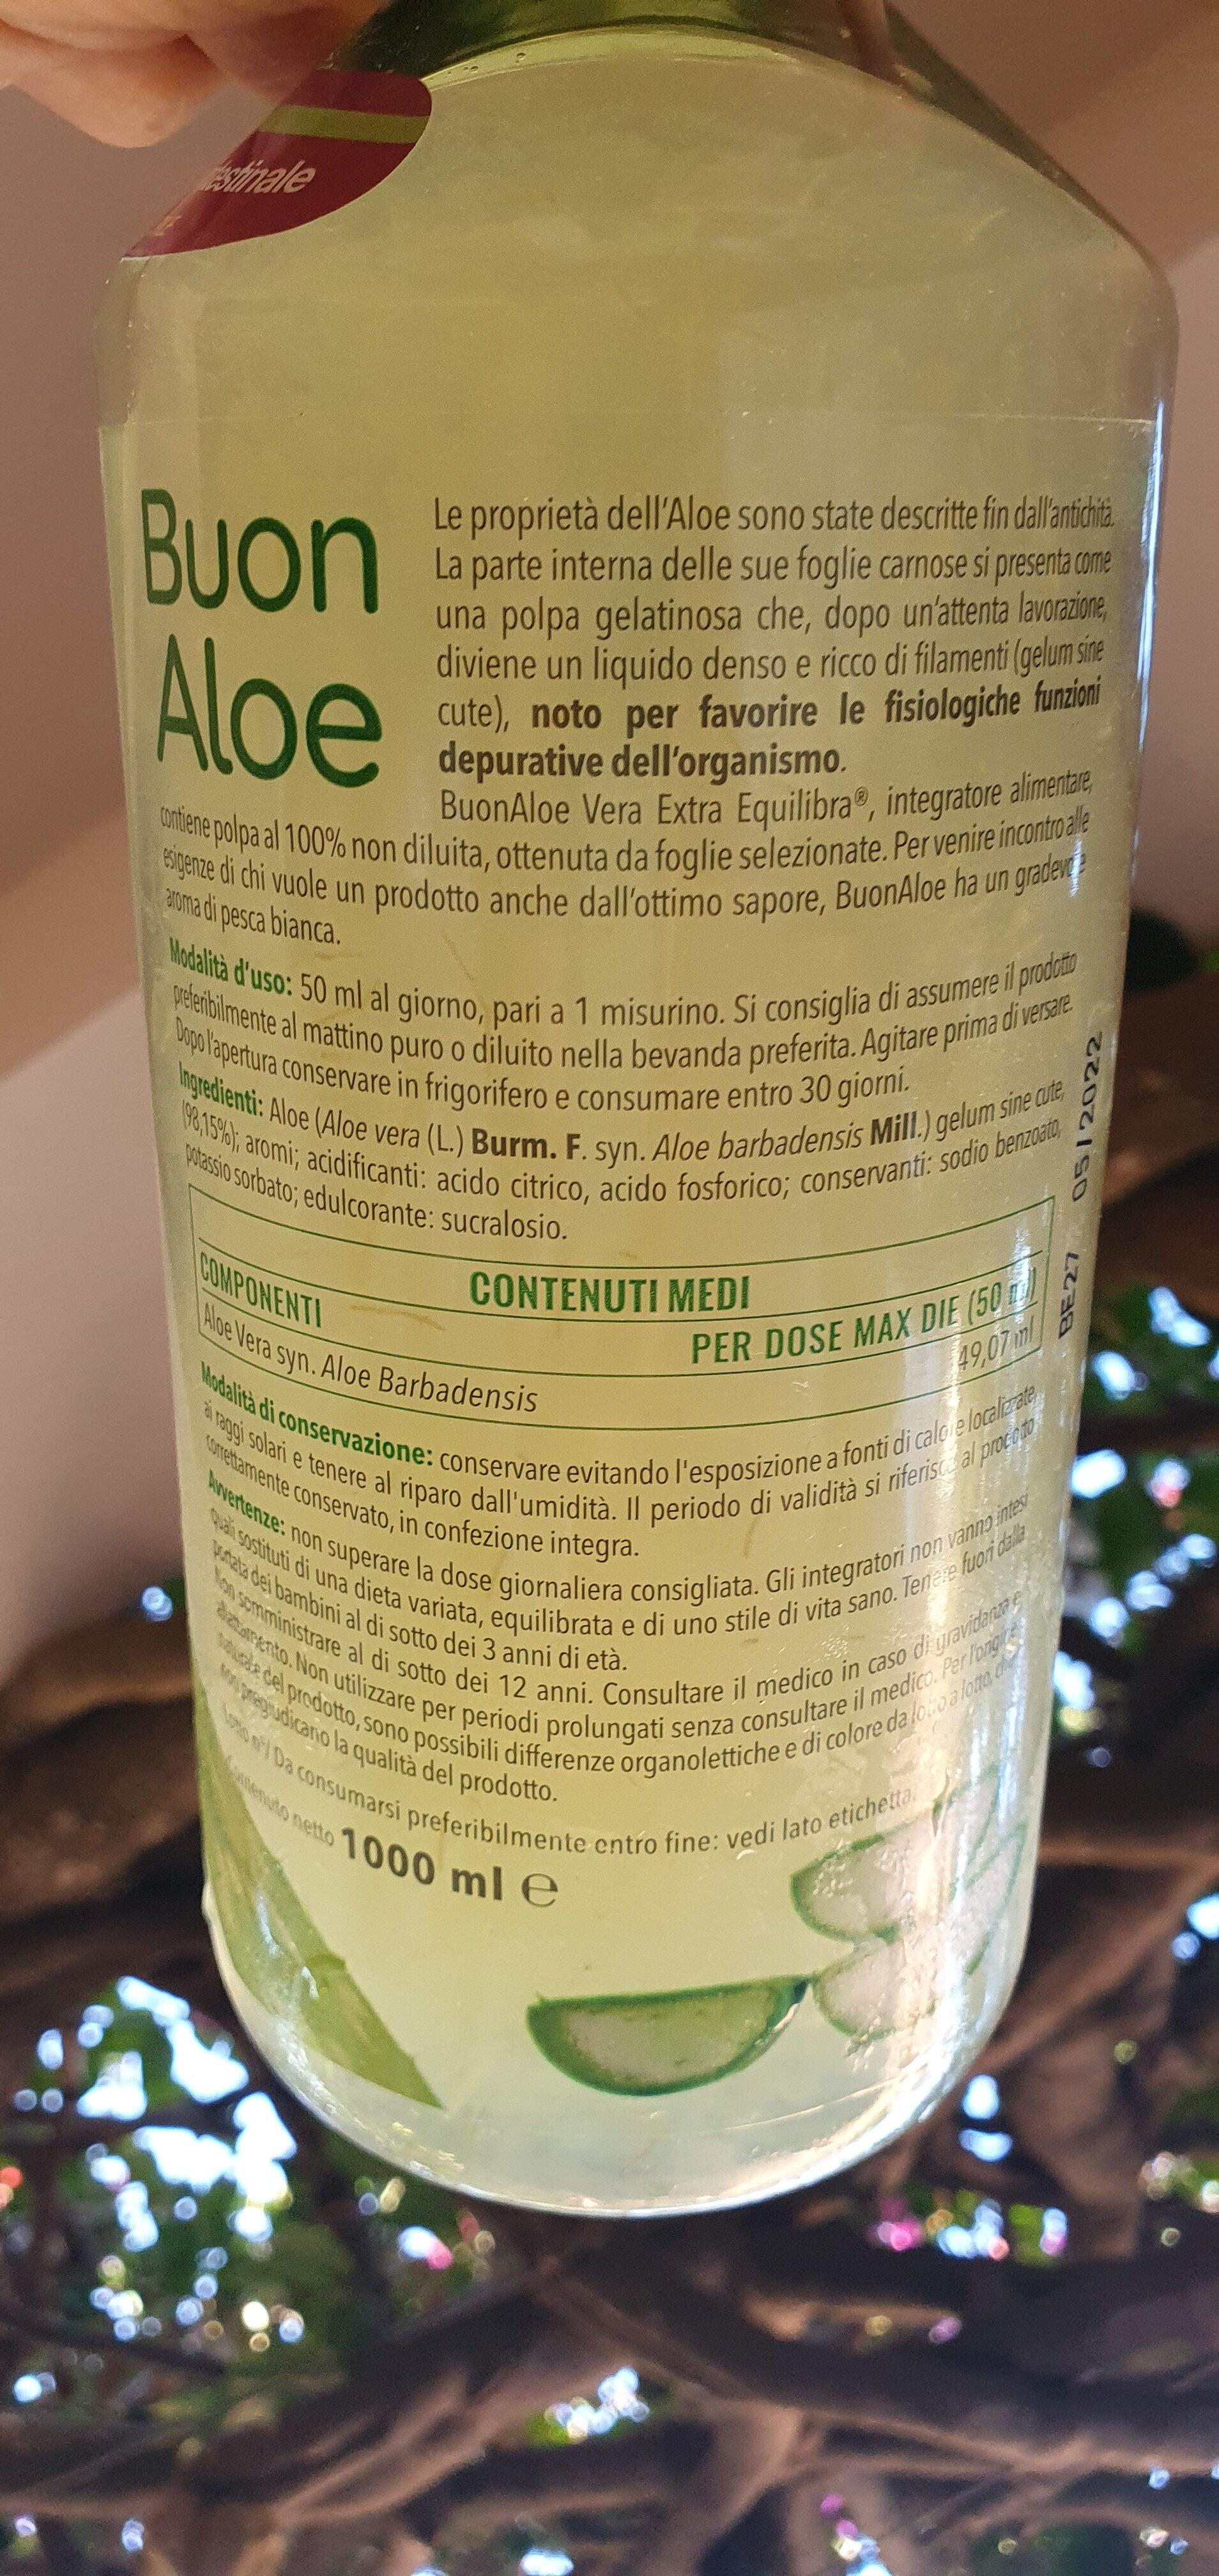 EQUILIBRA Buon Aloe - Product - it